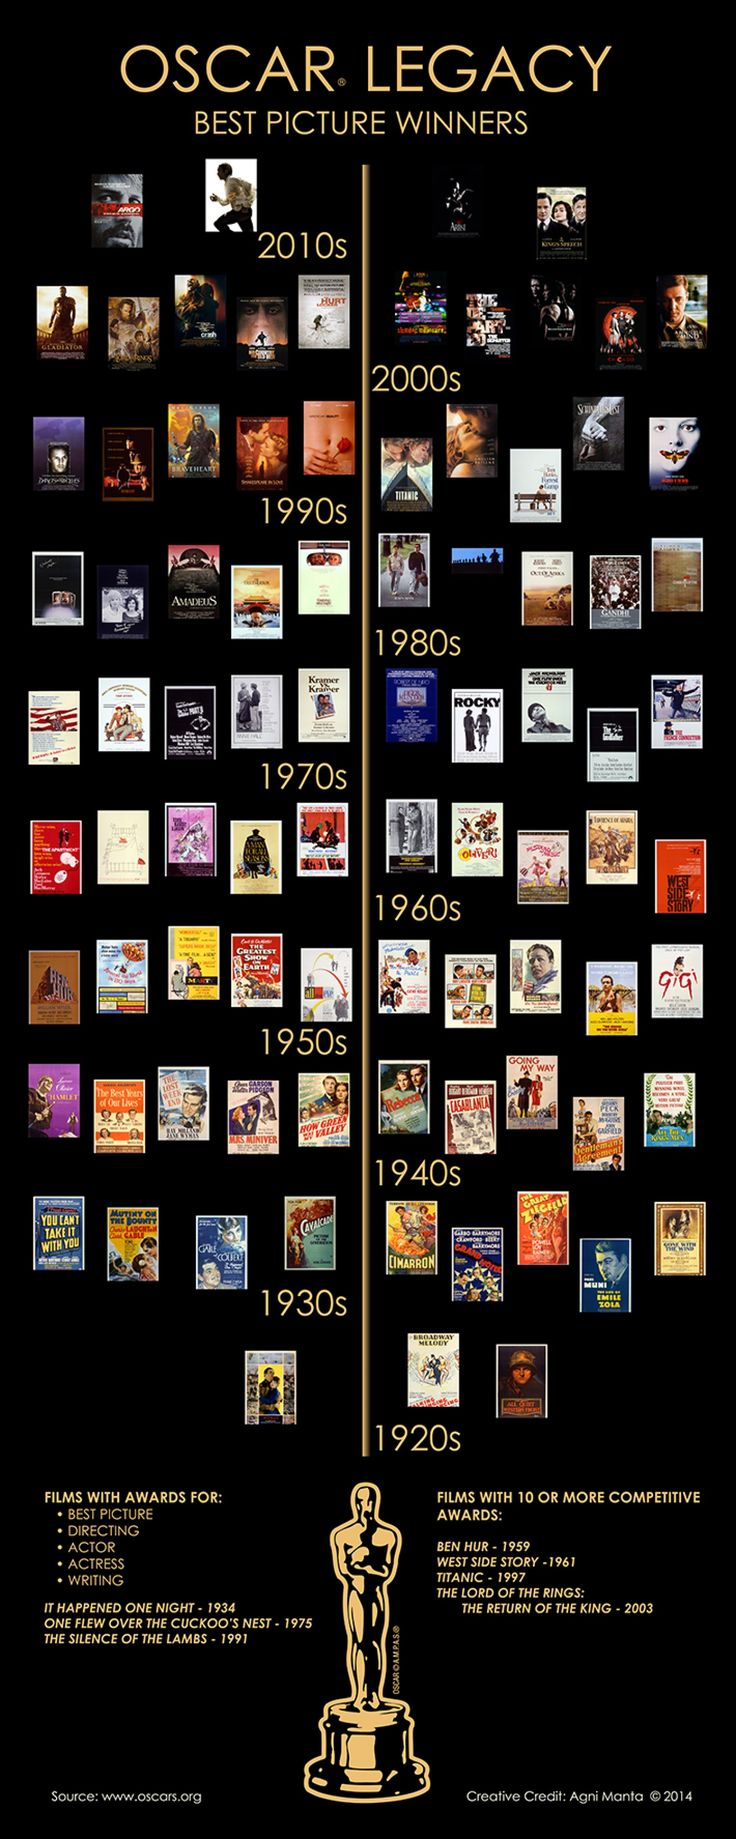 3/6/14 2:06a The Best Picture Oscar Historical Legacy Poster oscar.org visual.ly.com agnimanta.com